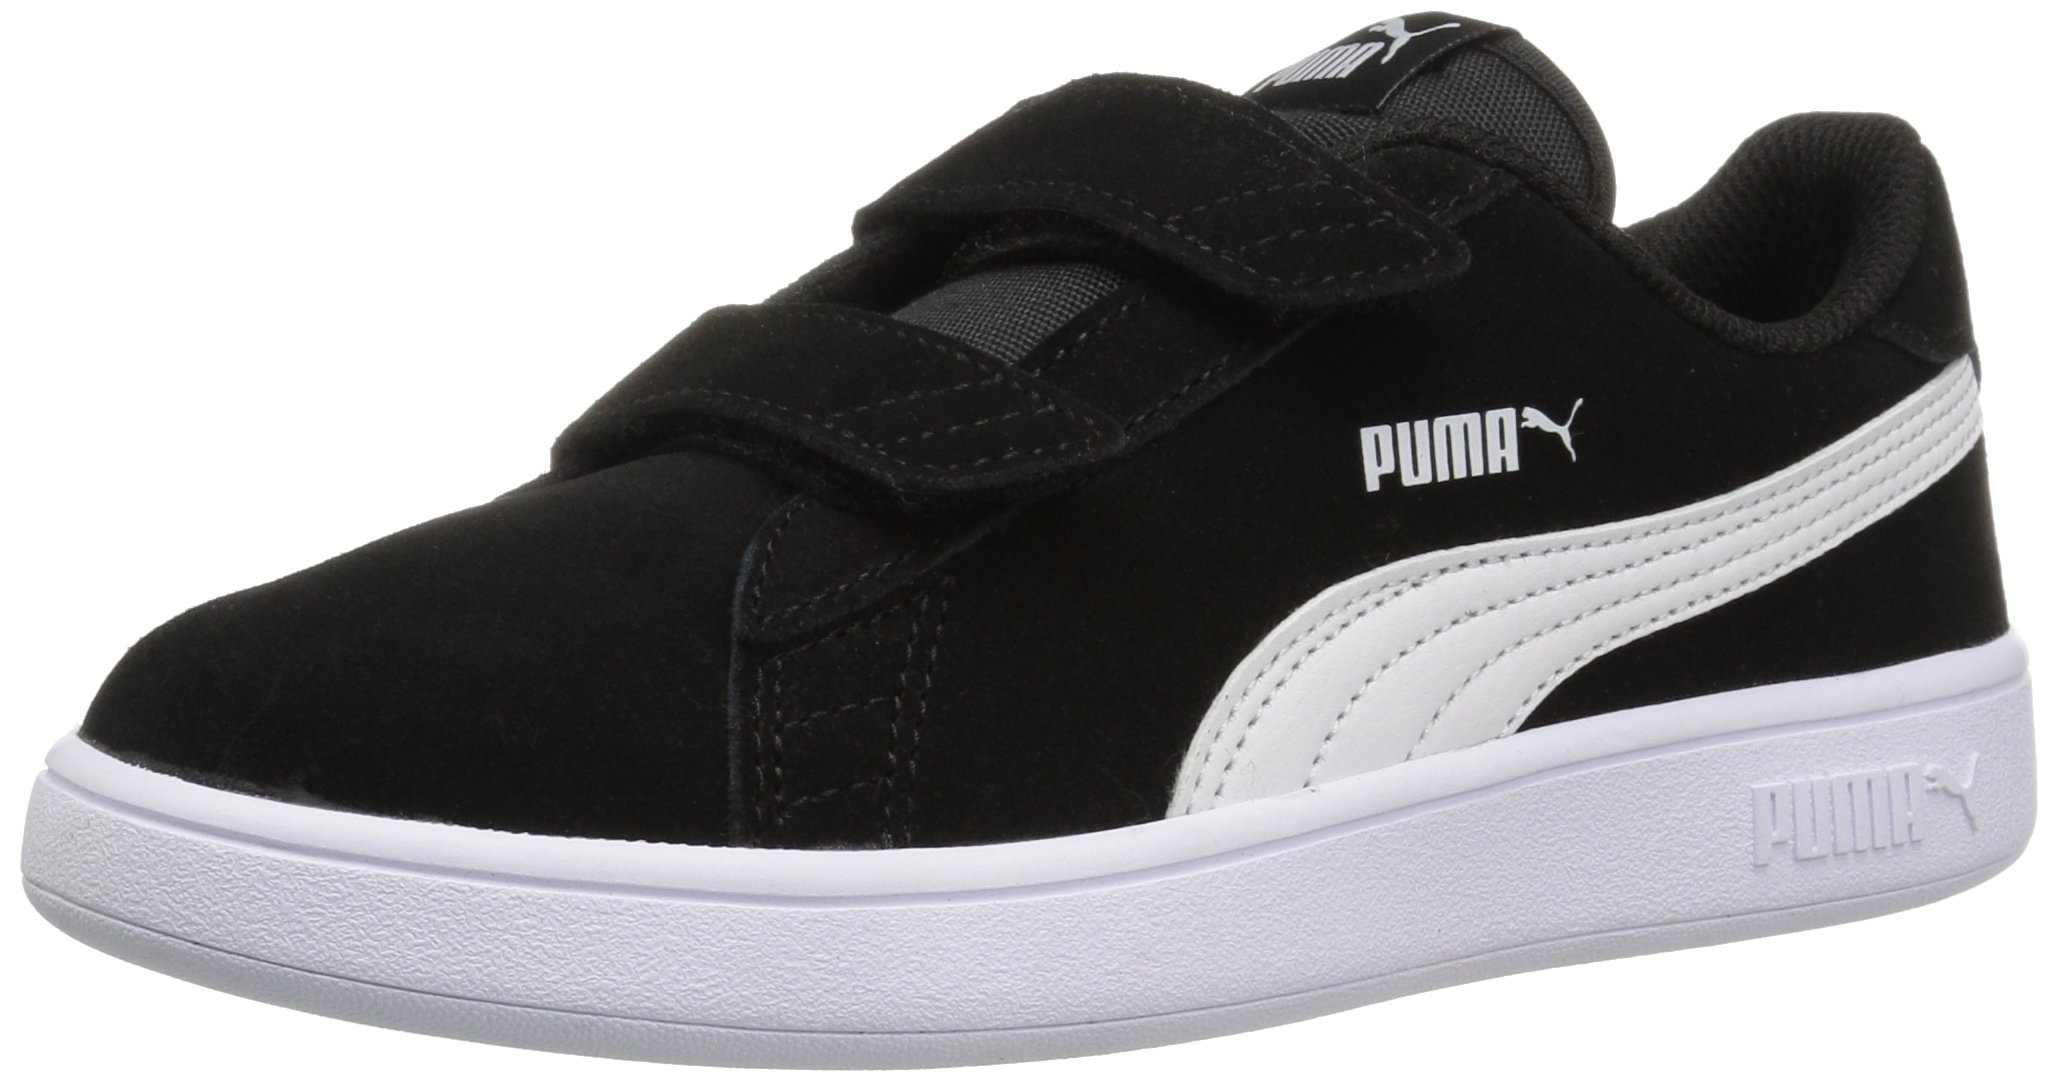 pretty nice e4ef9 d5ff3 PUMA Smash v2 Suede Preschool Sneakers (Puma Black/Puma White)(3 M US  Little Kid)